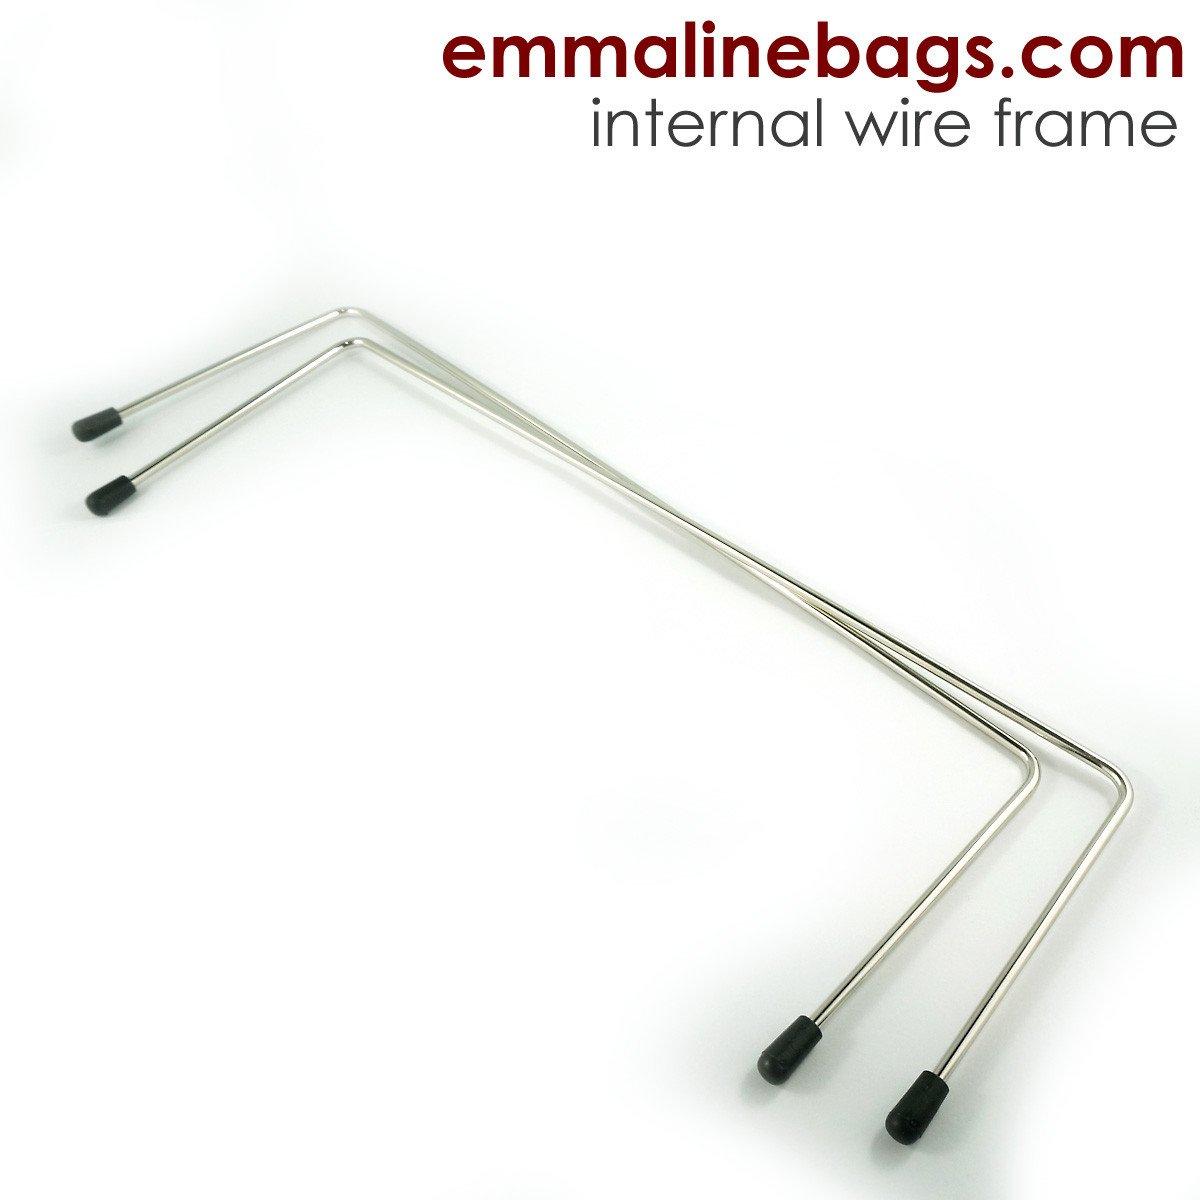 Emmaline - Internal Wire Frames - Bag Frame - Style B